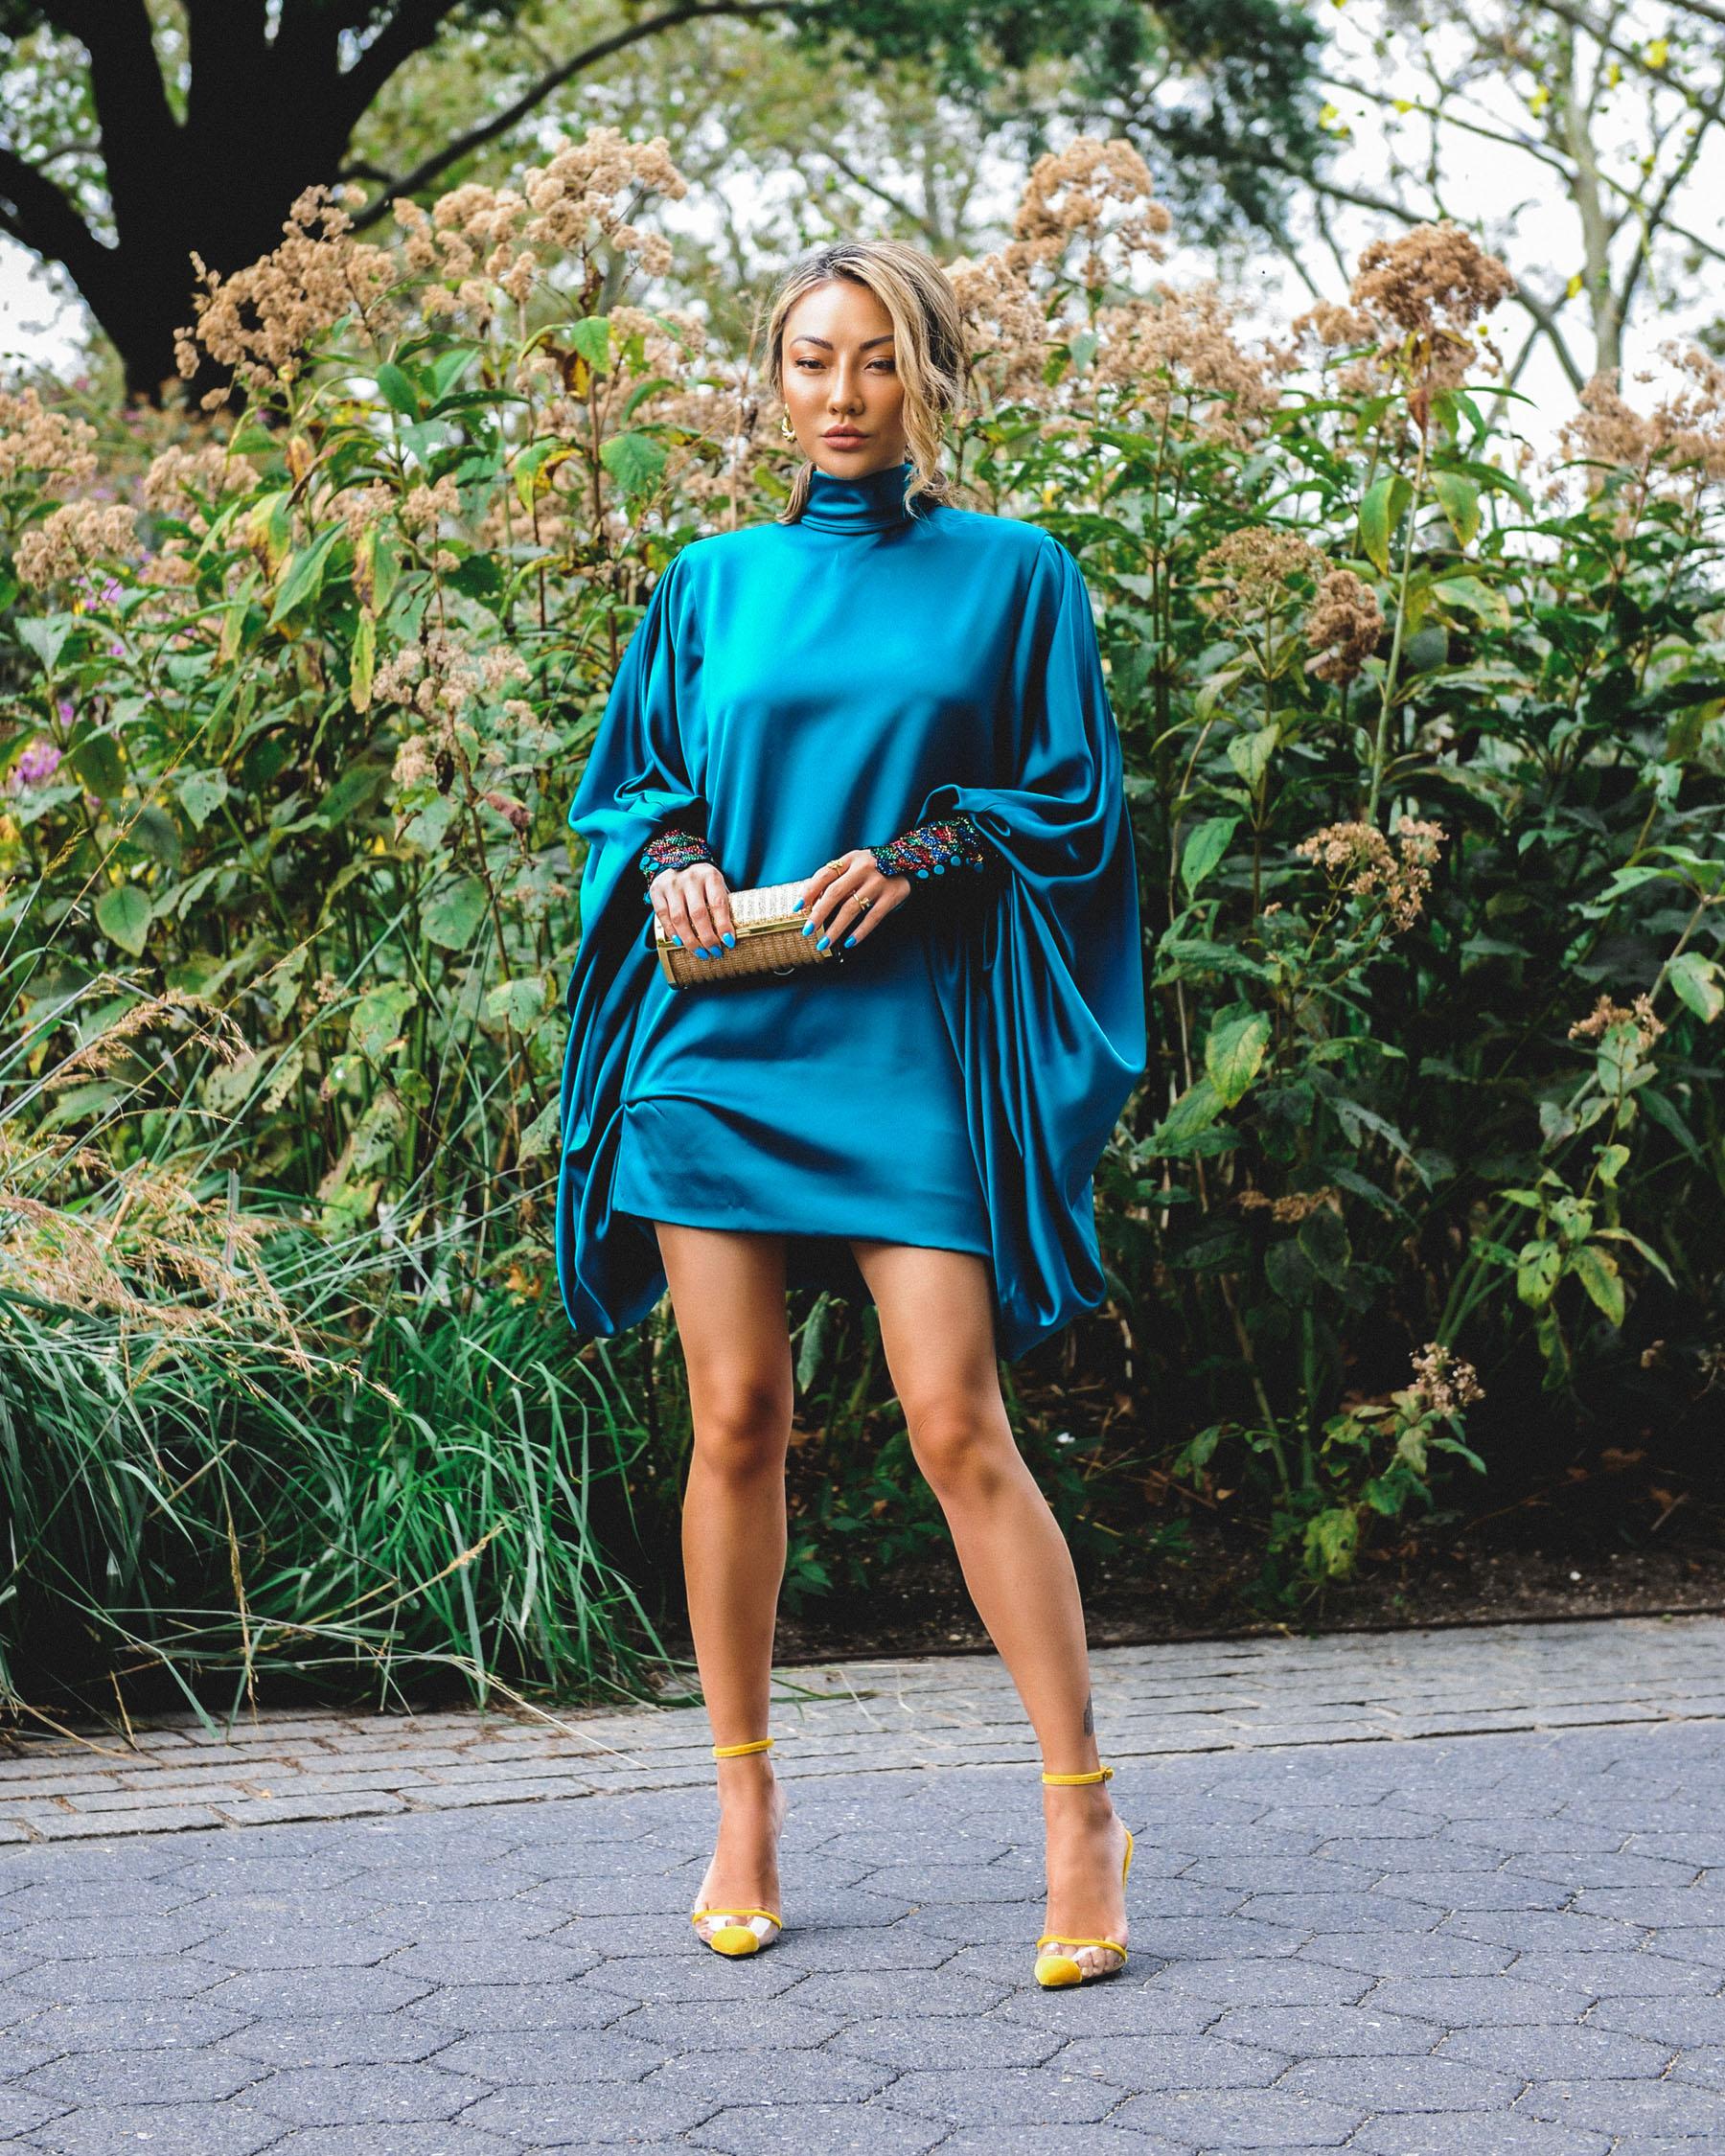 nyfw ss20, blue carolina herrera dress, nyfw street style // Notjessfashion.com